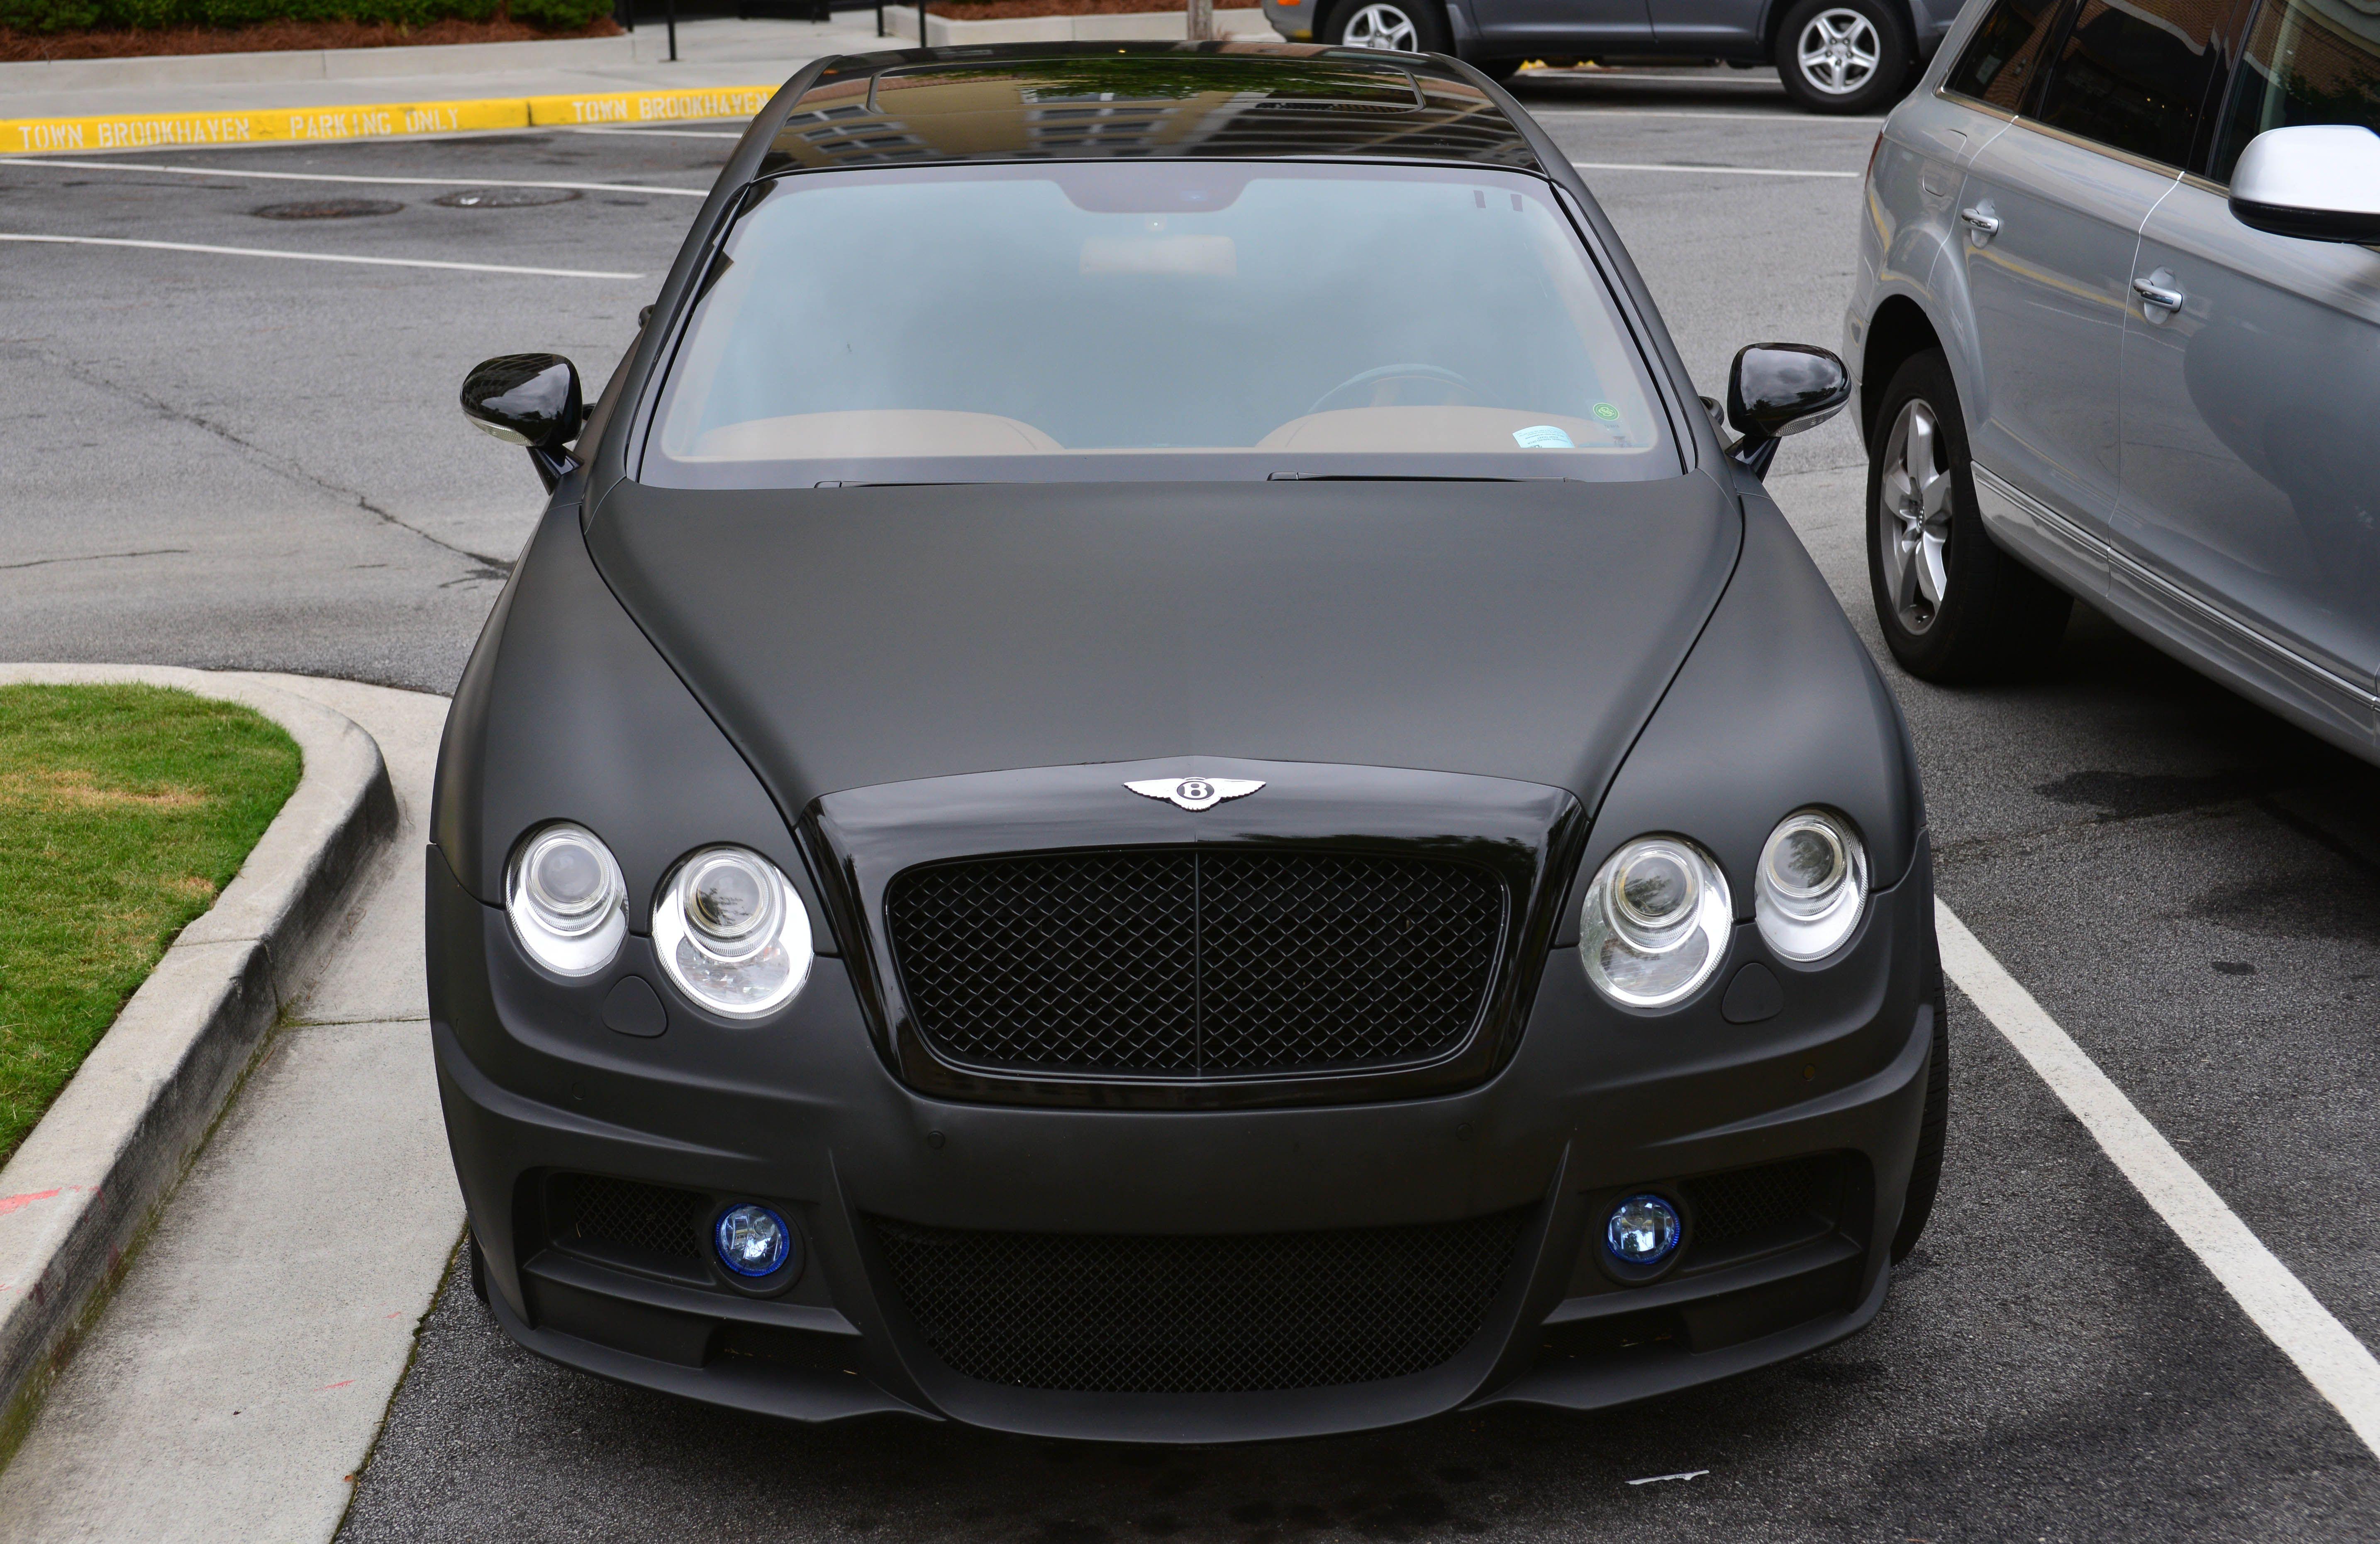 Matte Black Bentley Flying Spur Atlanta Streets Black Bentley Bentley Flying Spur Flying Spur